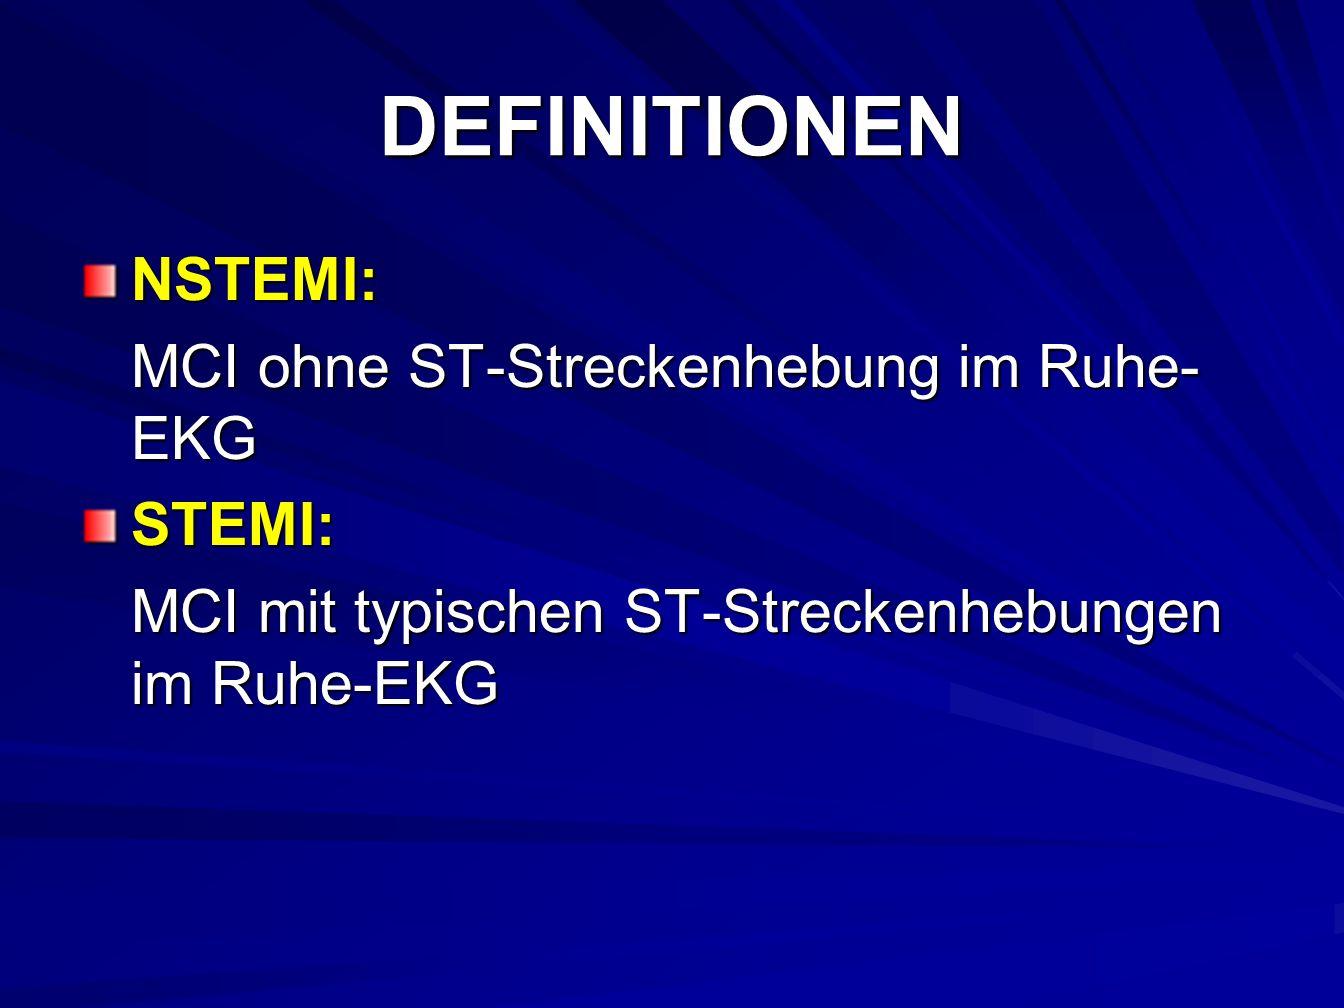 DEFINITIONEN NSTEMI: MCI ohne ST-Streckenhebung im Ruhe-EKG STEMI: